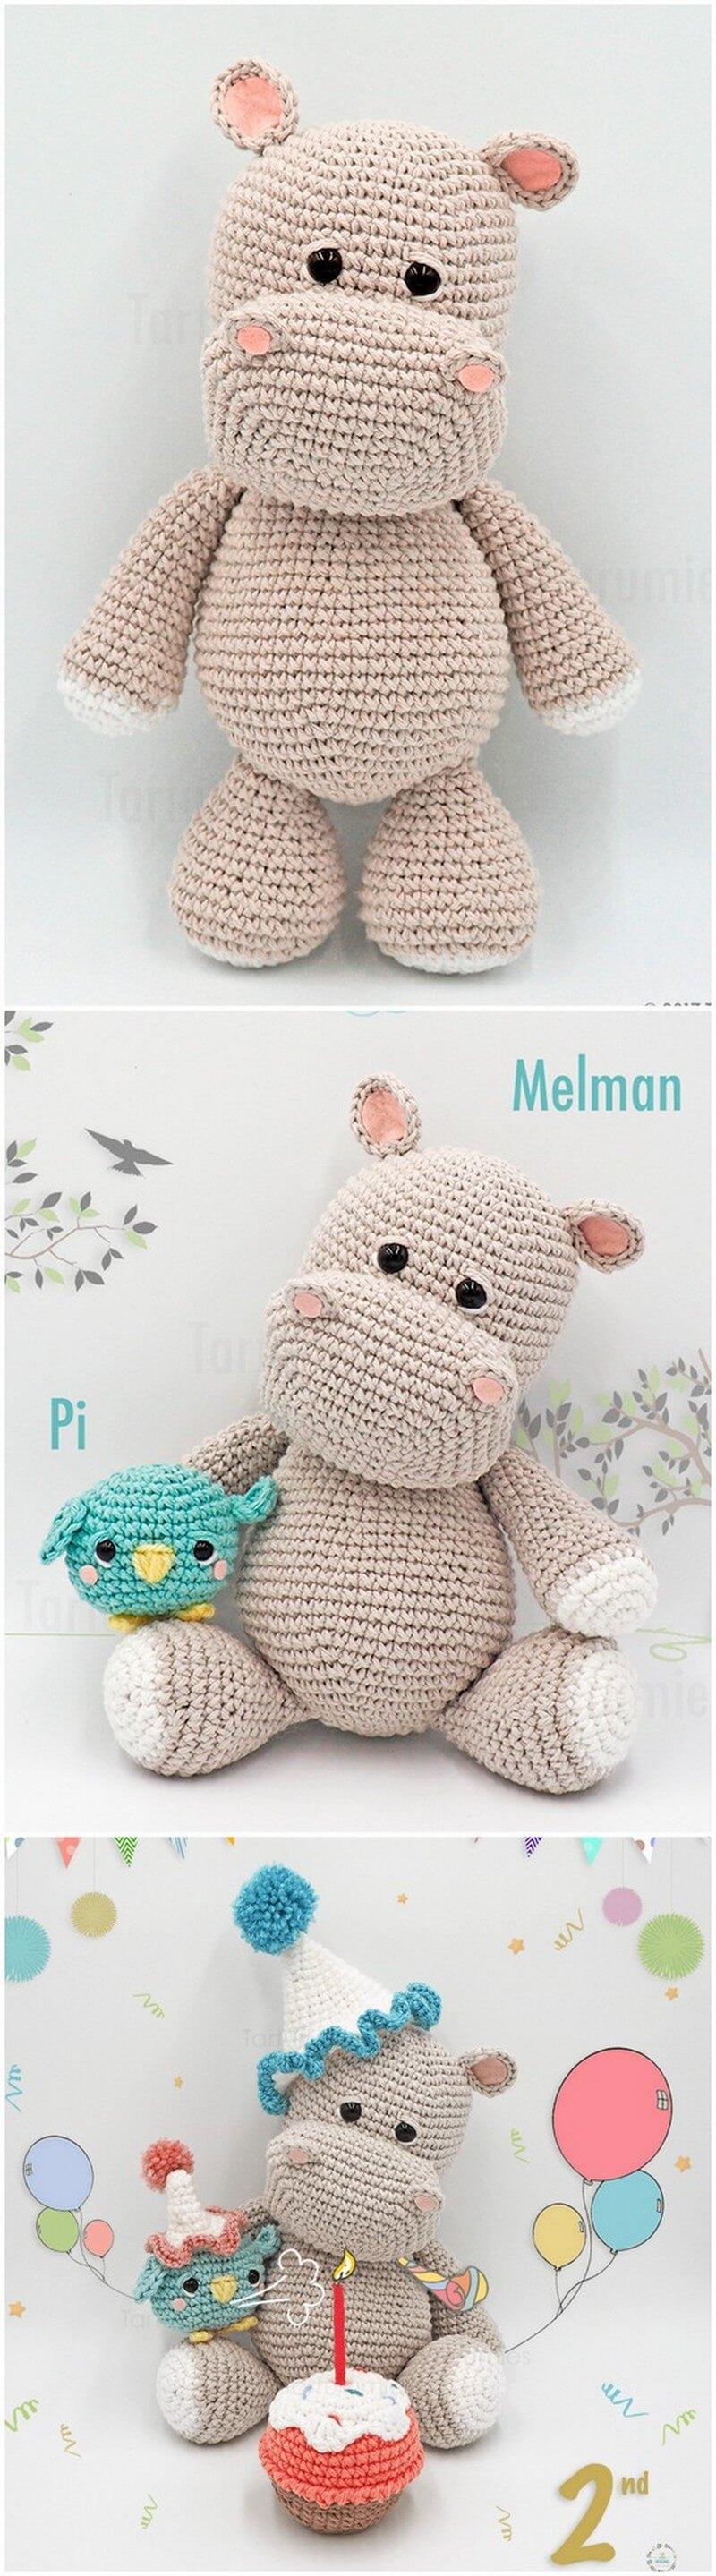 Crochet Amigurumi Pattern (8)